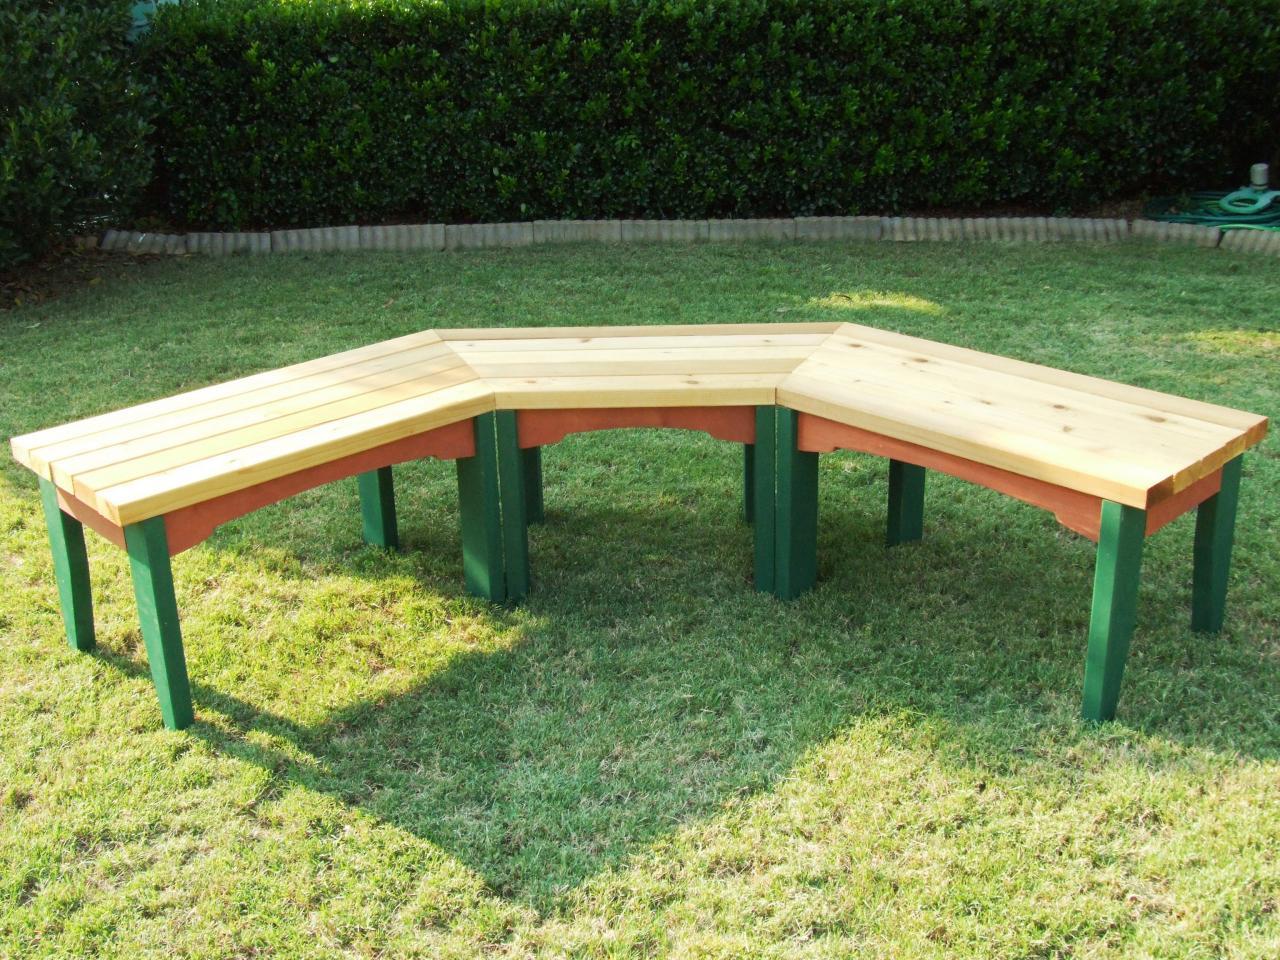 How to Build a Semi-Circular Wooden Bench | how-tos | DIY